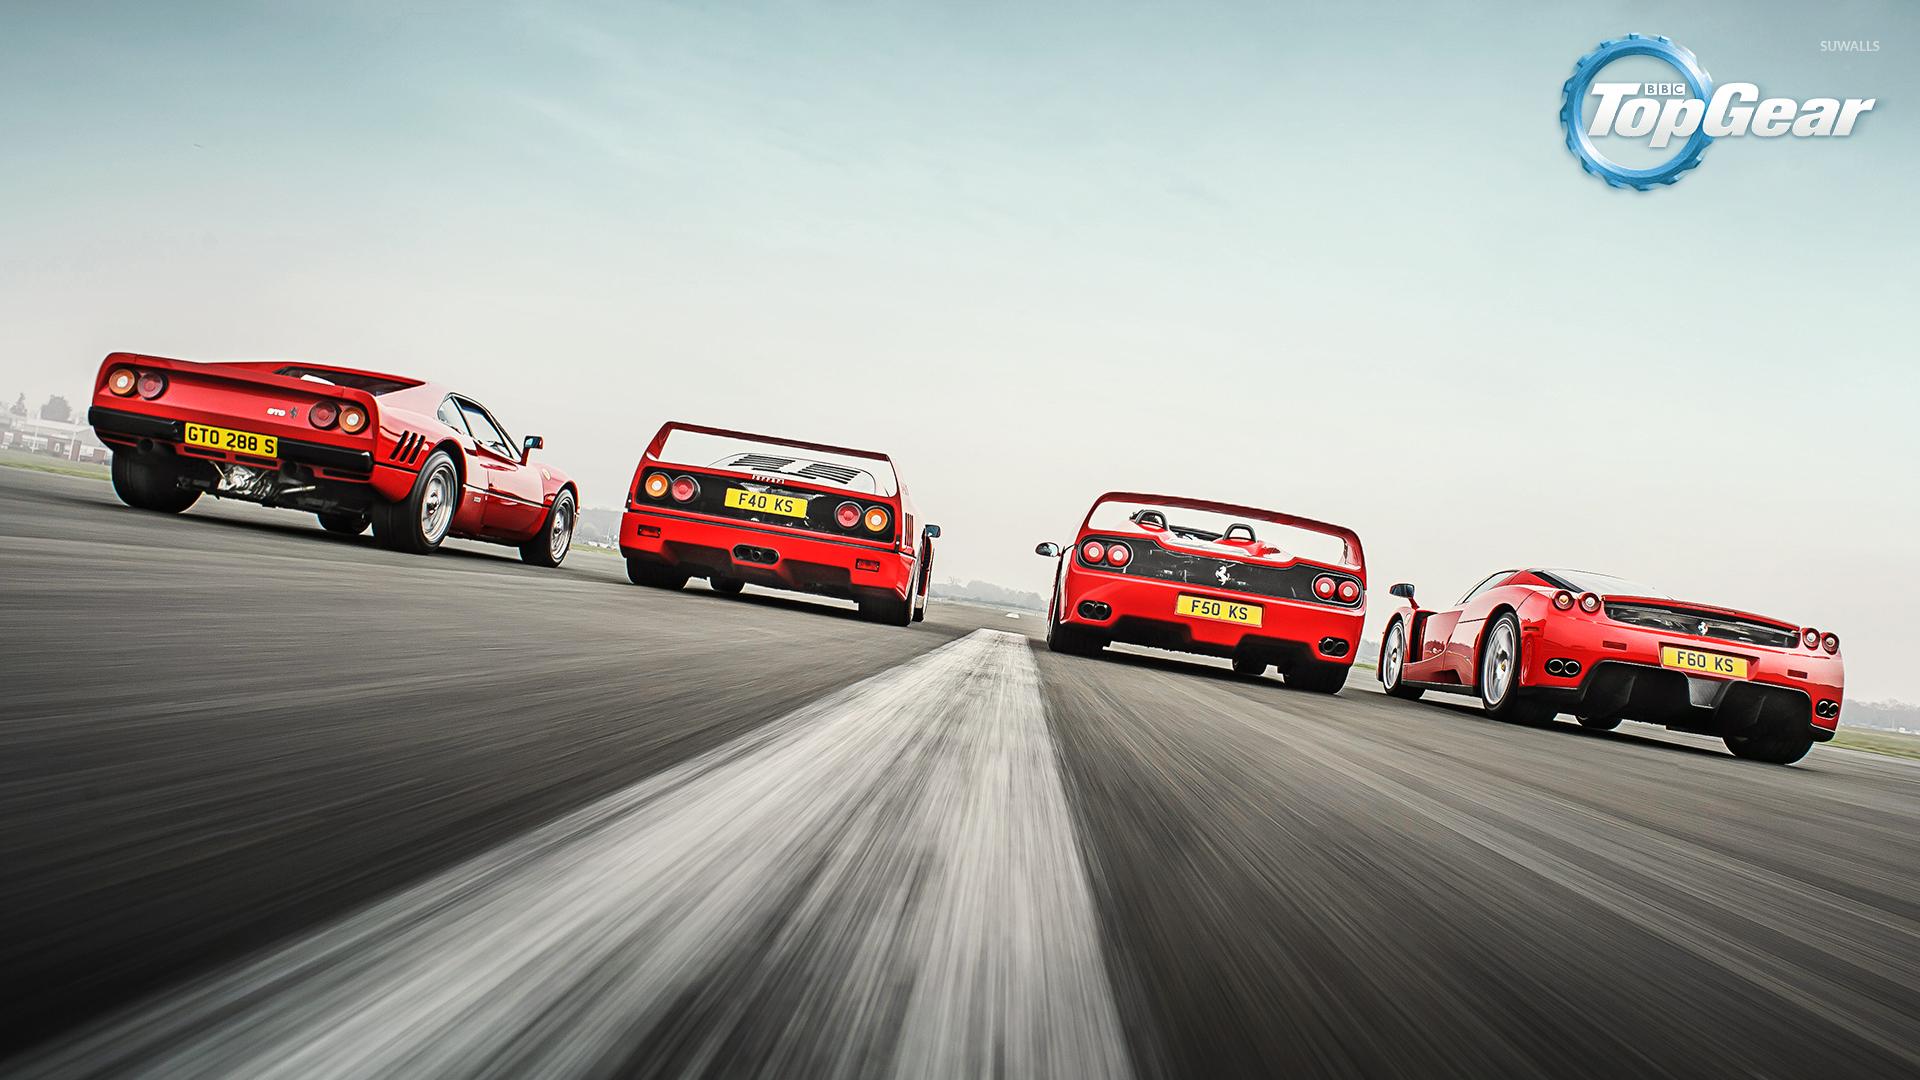 ferrari race in top gear wallpaper tv show wallpapers 52778